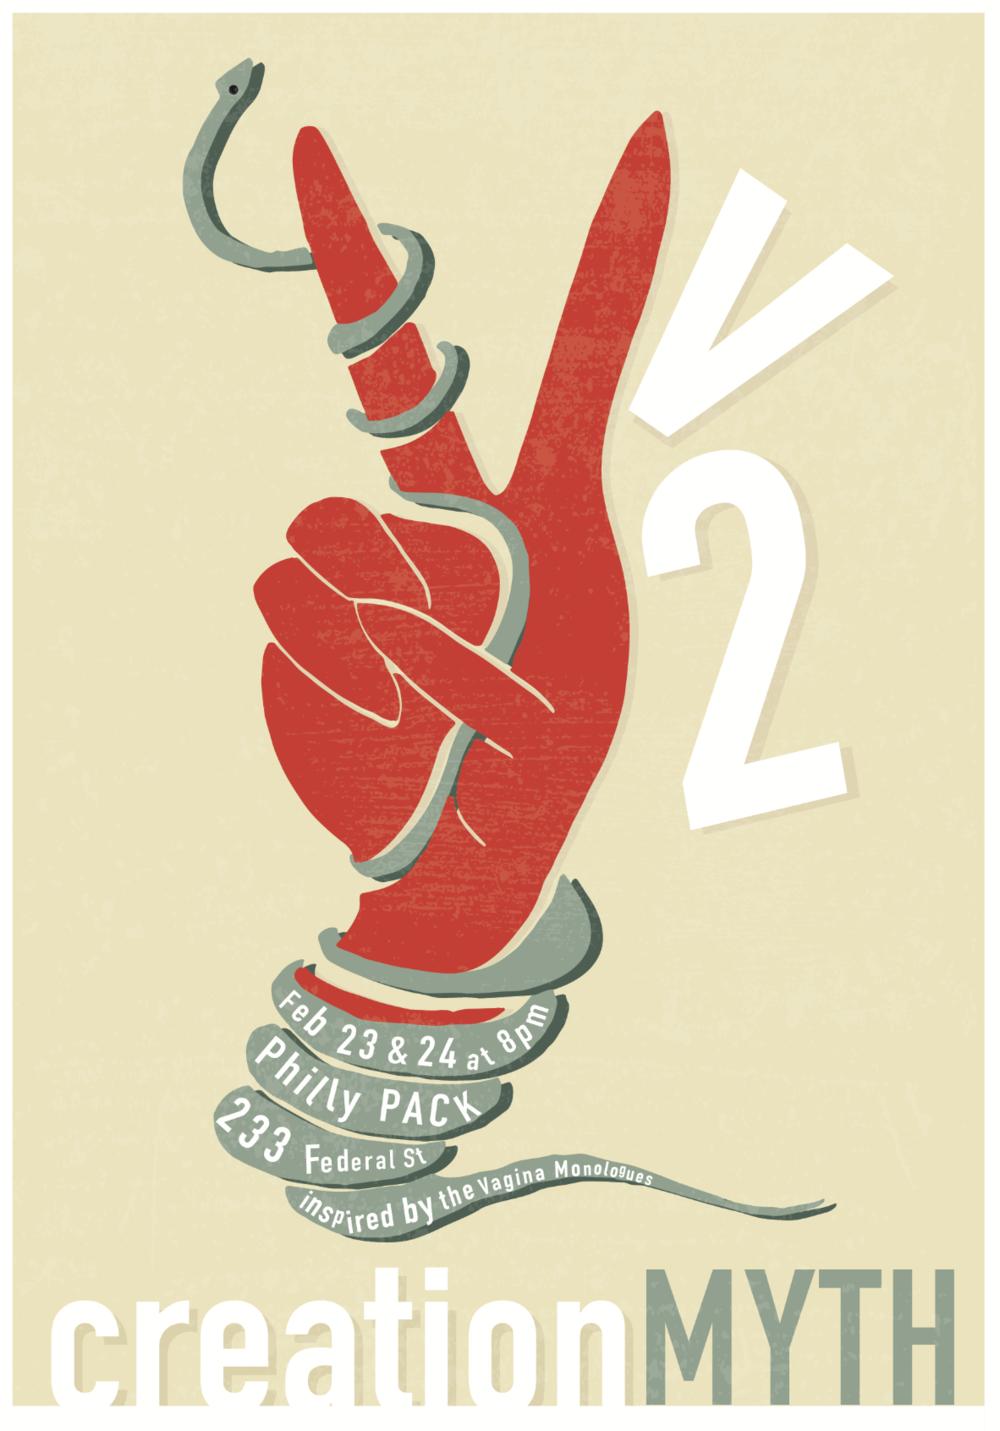 V2 Creation Myth - Poster